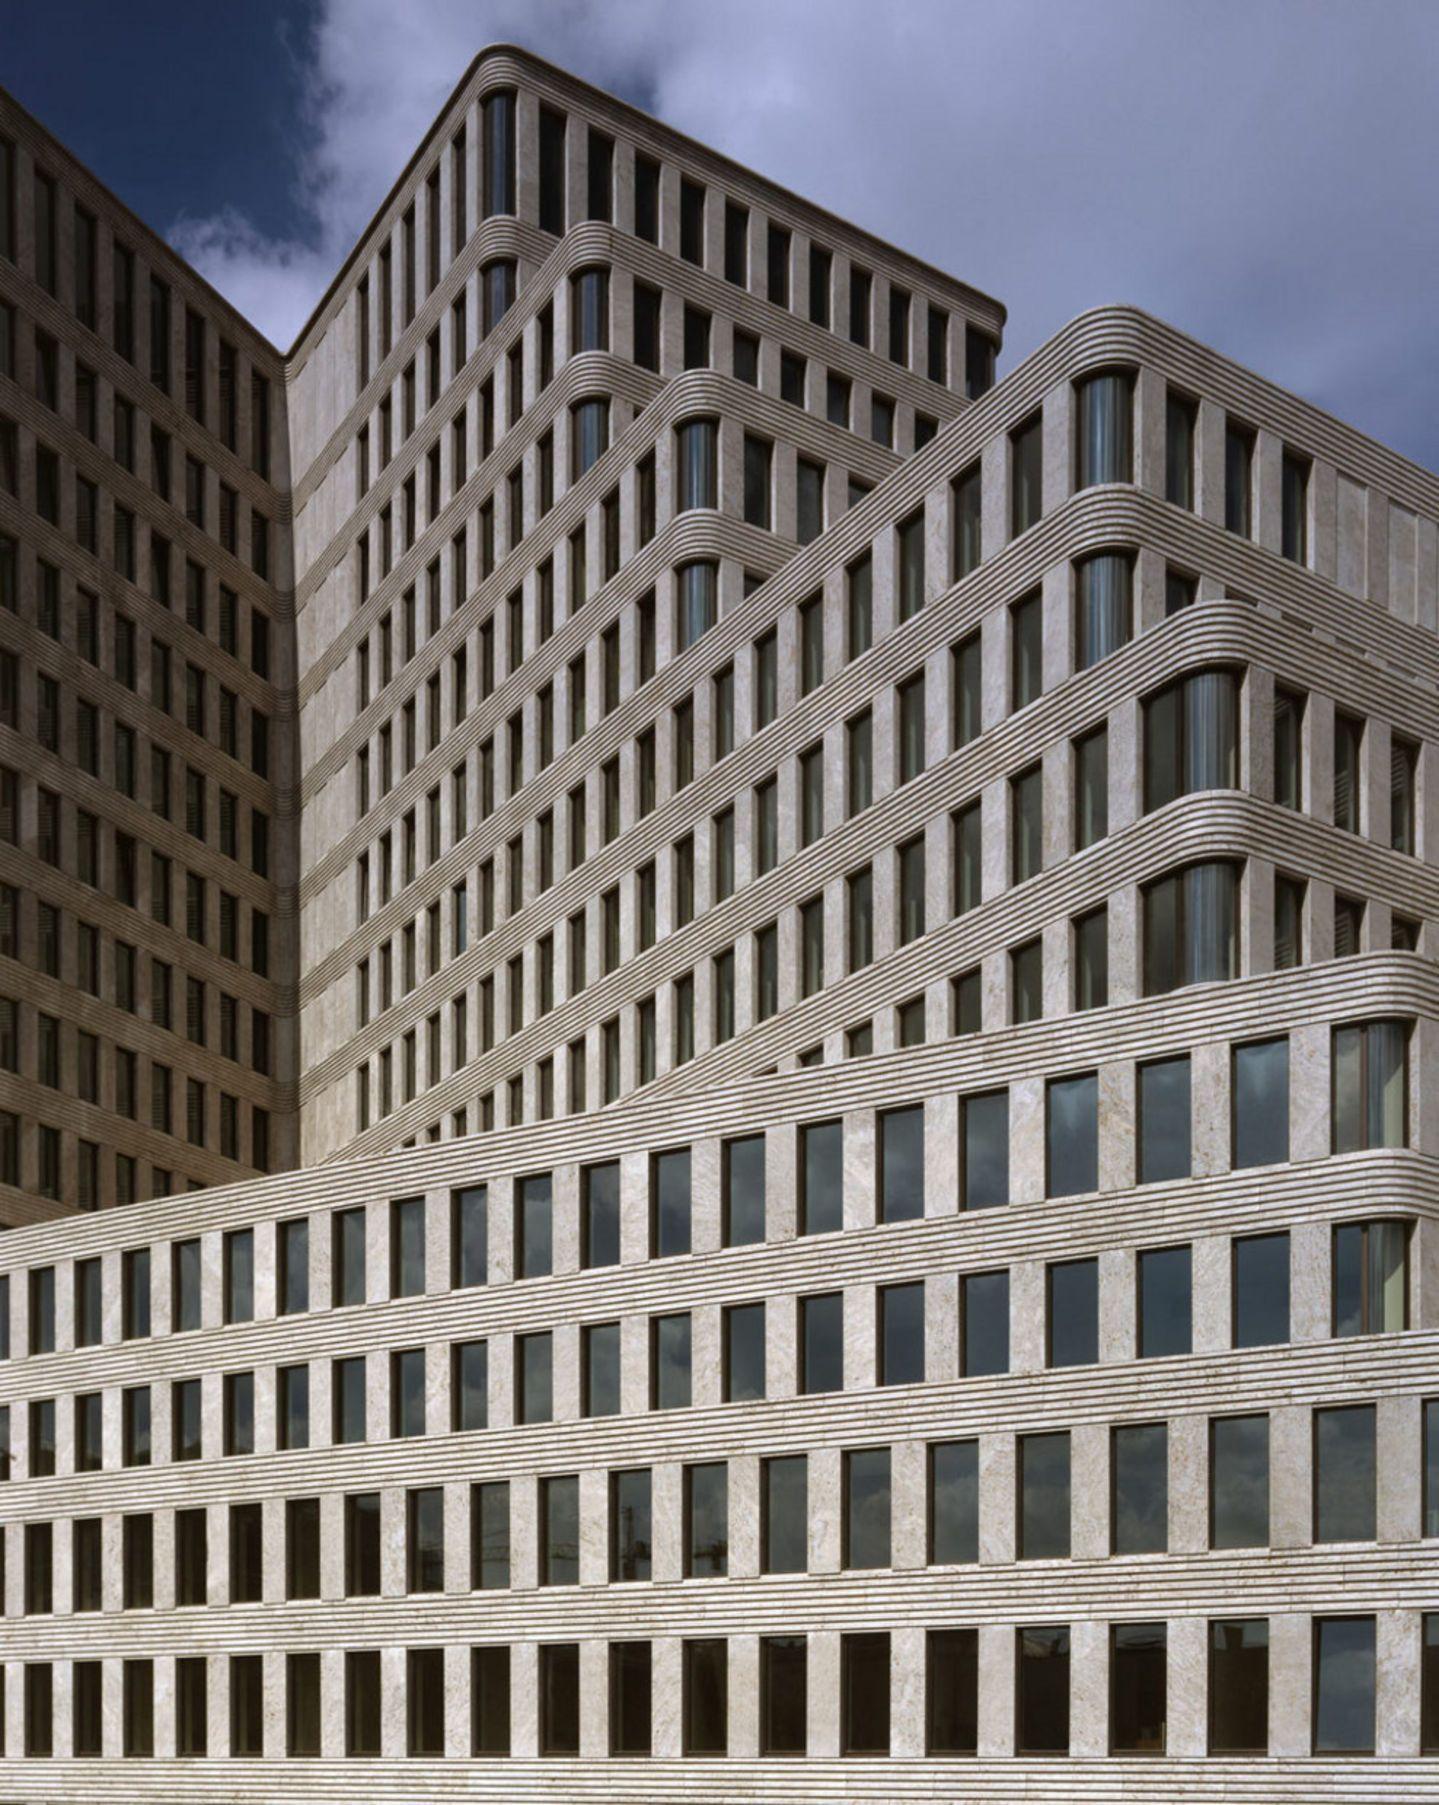 Kleihues Kleihues Jan Kleihues Stefan Muller Hotel Concorde Divisare 地板